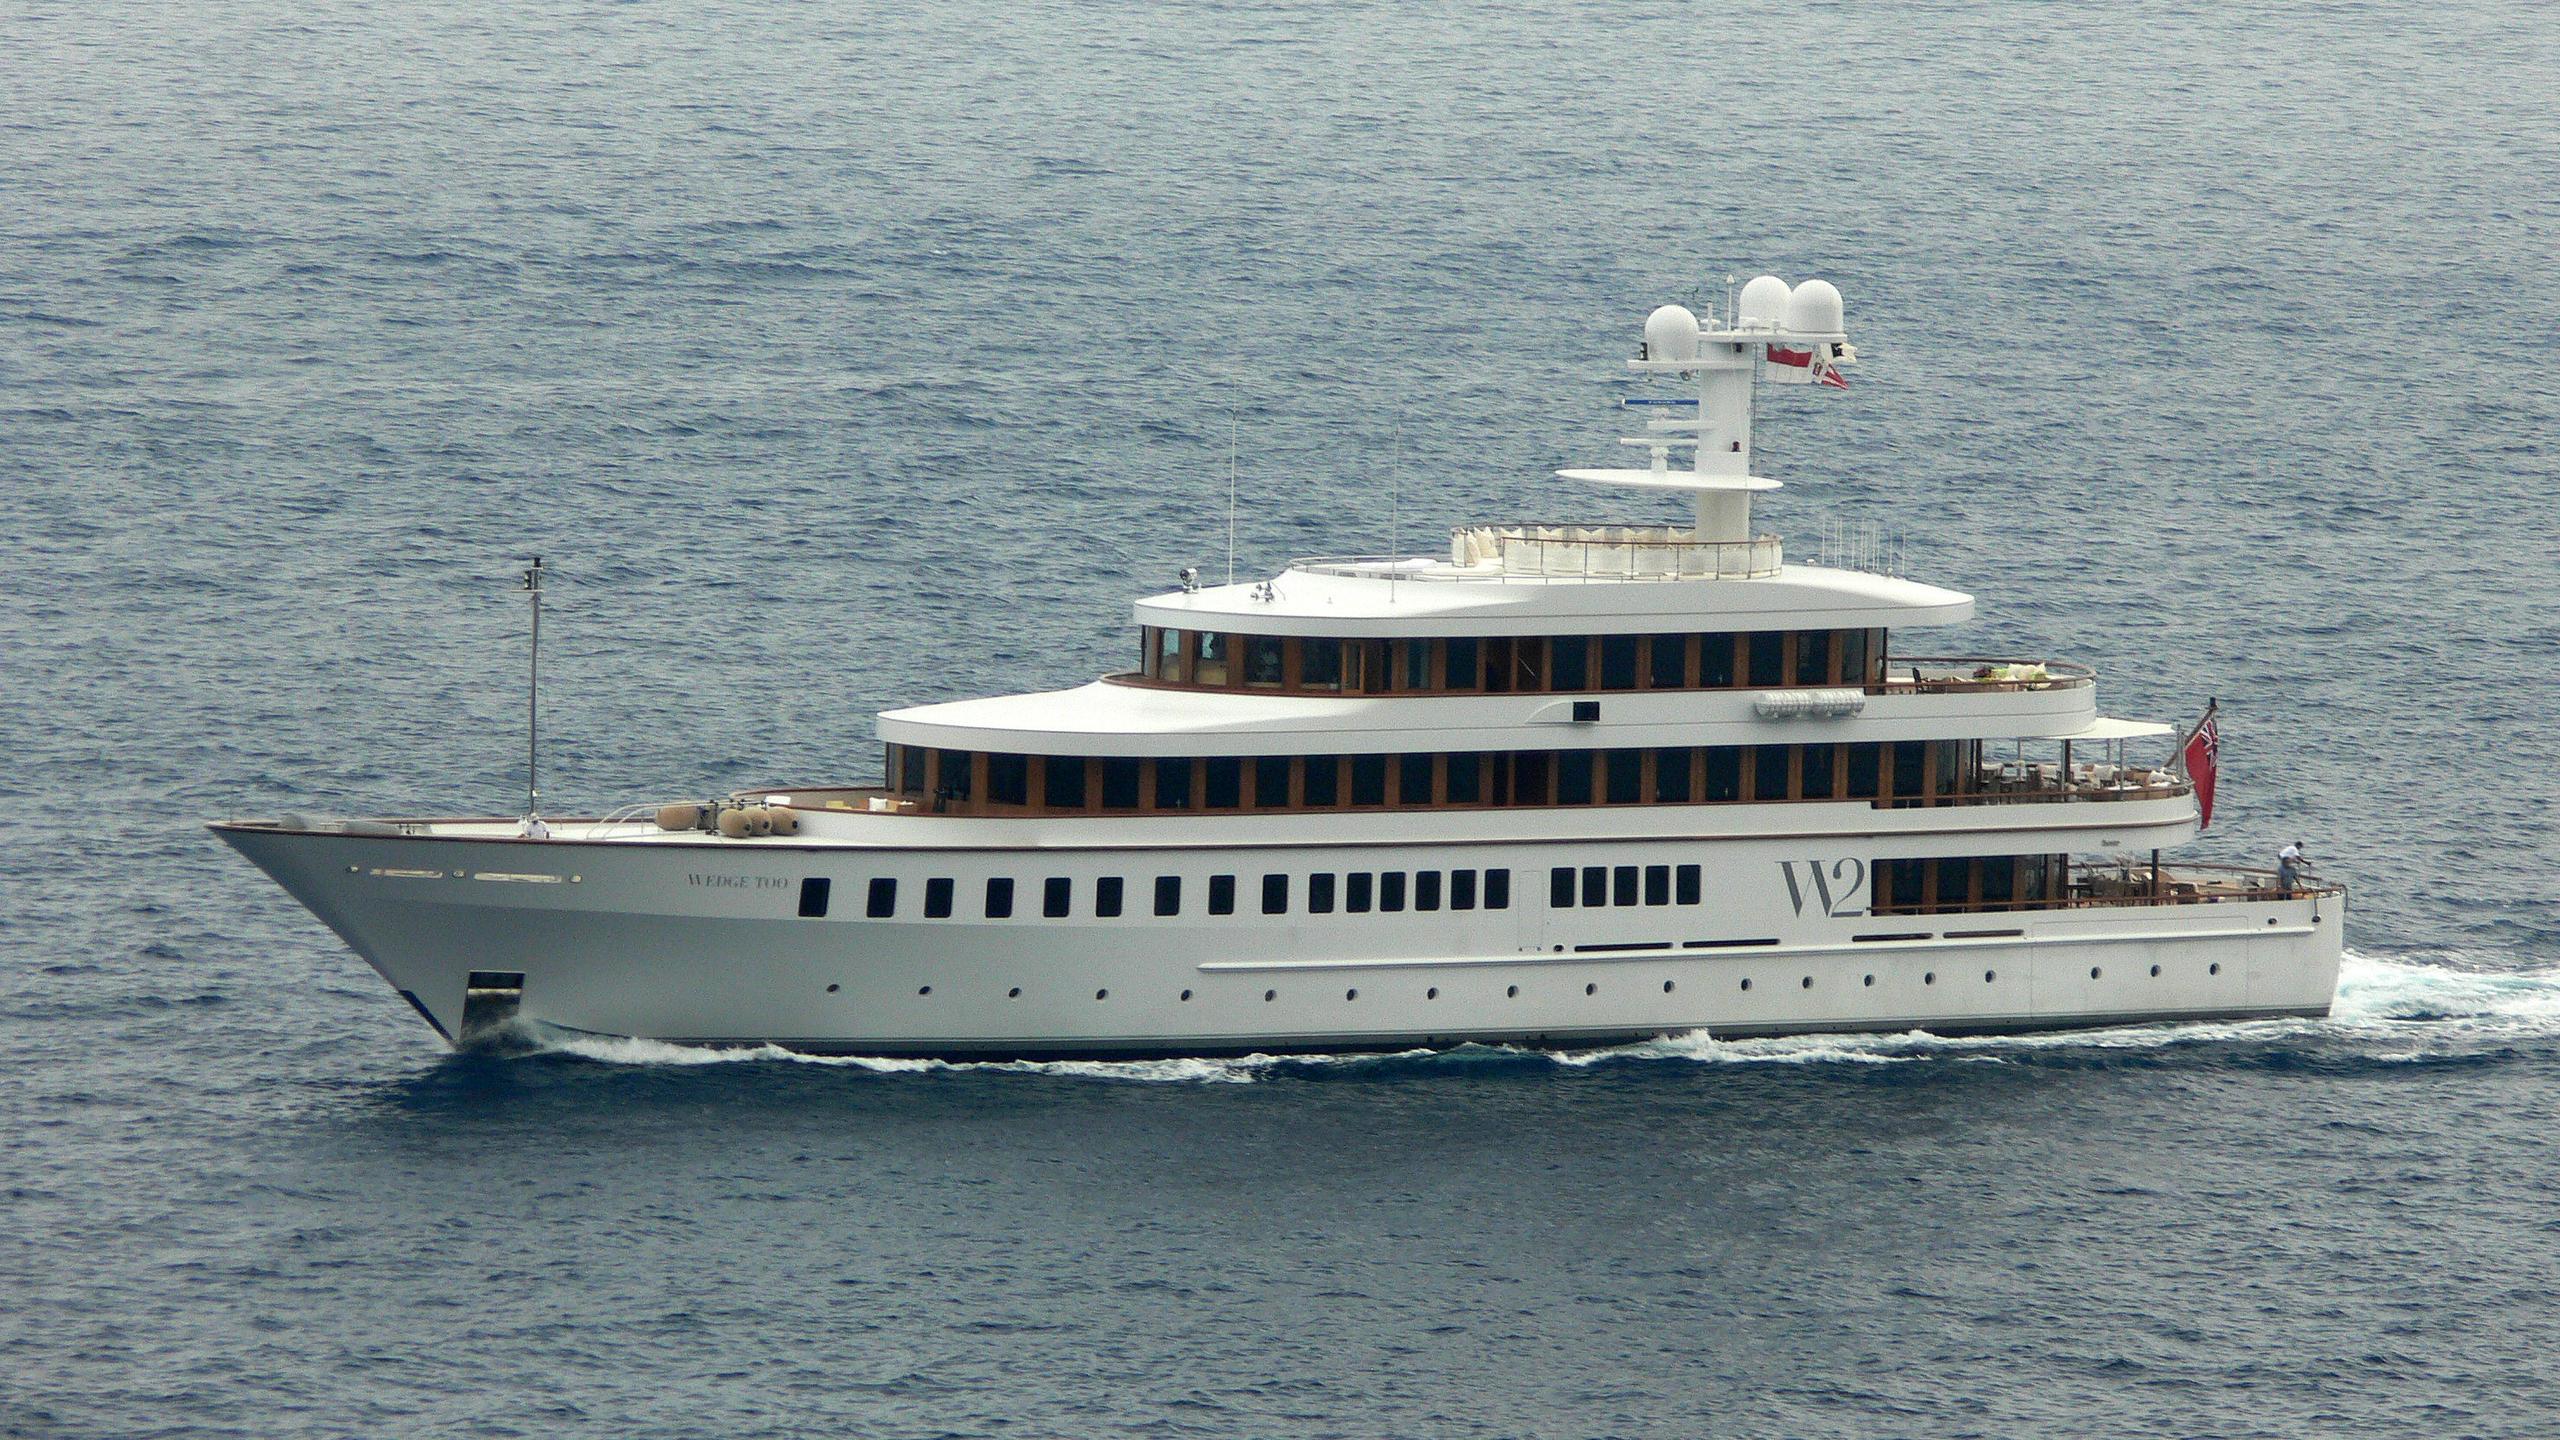 wedge-too-rmotor-yacht-feadship-2002-65m-profile